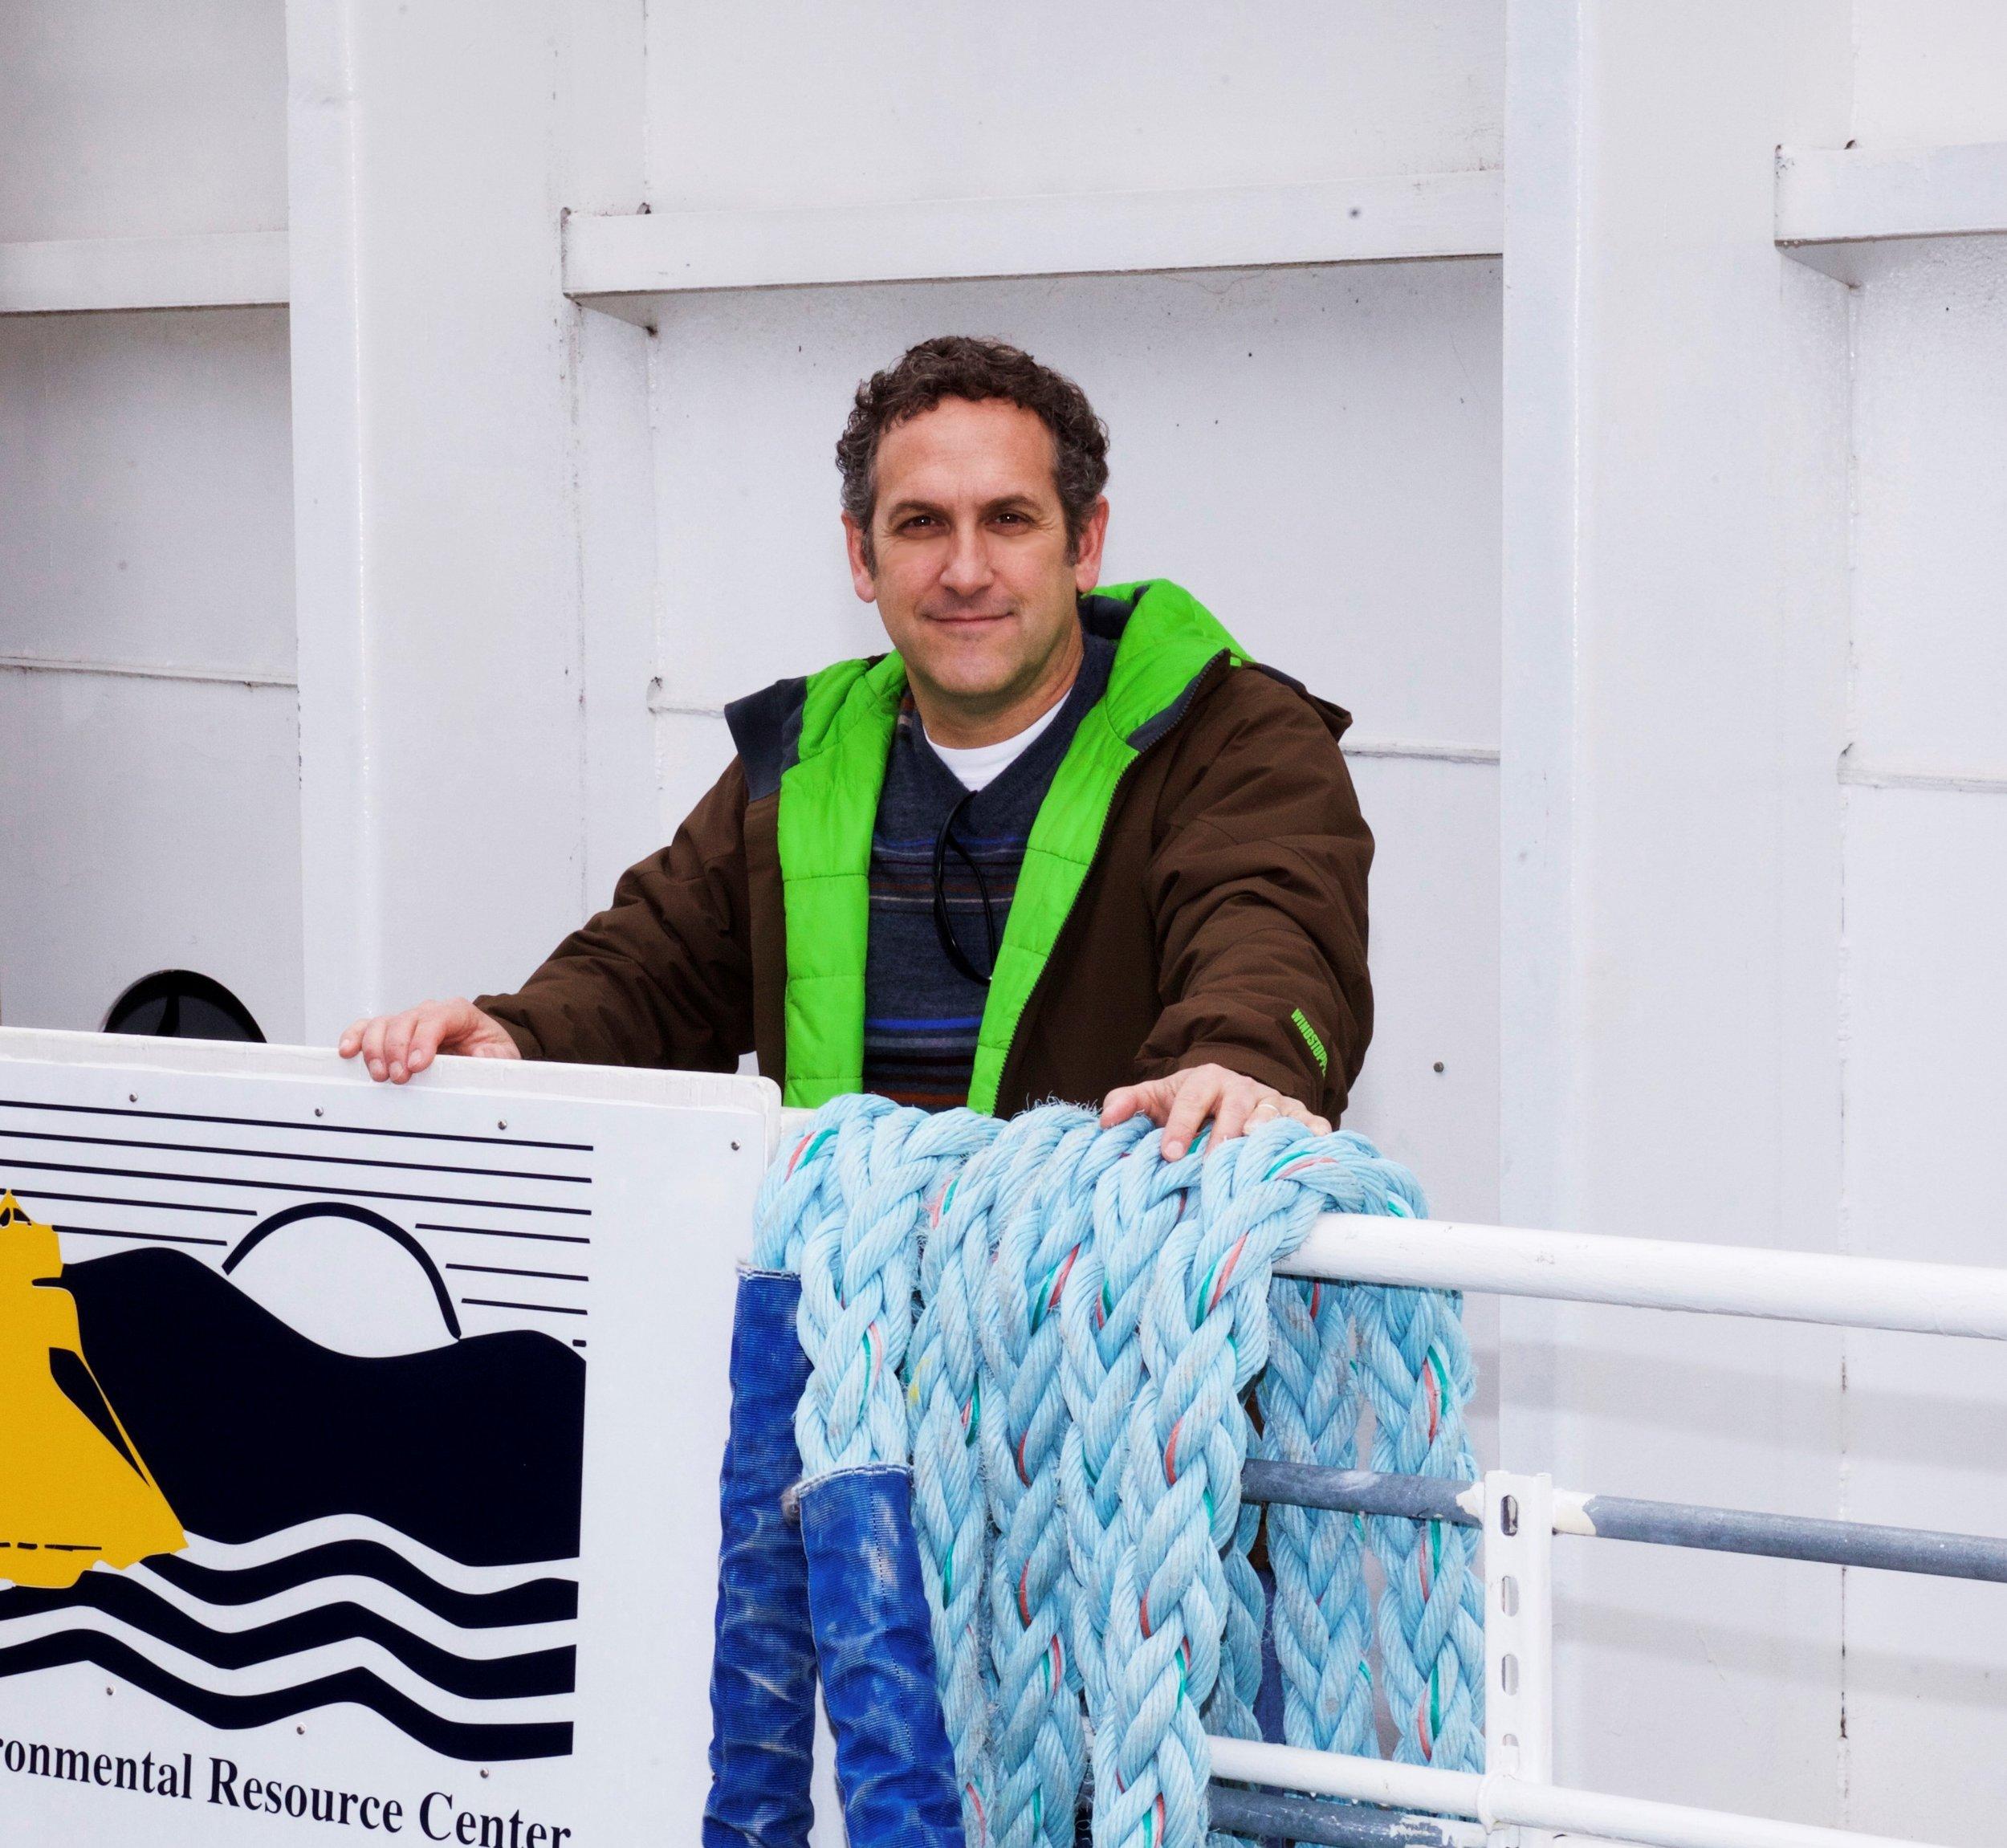 Dr. Mario Tamburri  Director, Alliance for Coastal Technologies and Maritime Environmental Resource Center  Professor, University of Maryland Center for Environmental Science